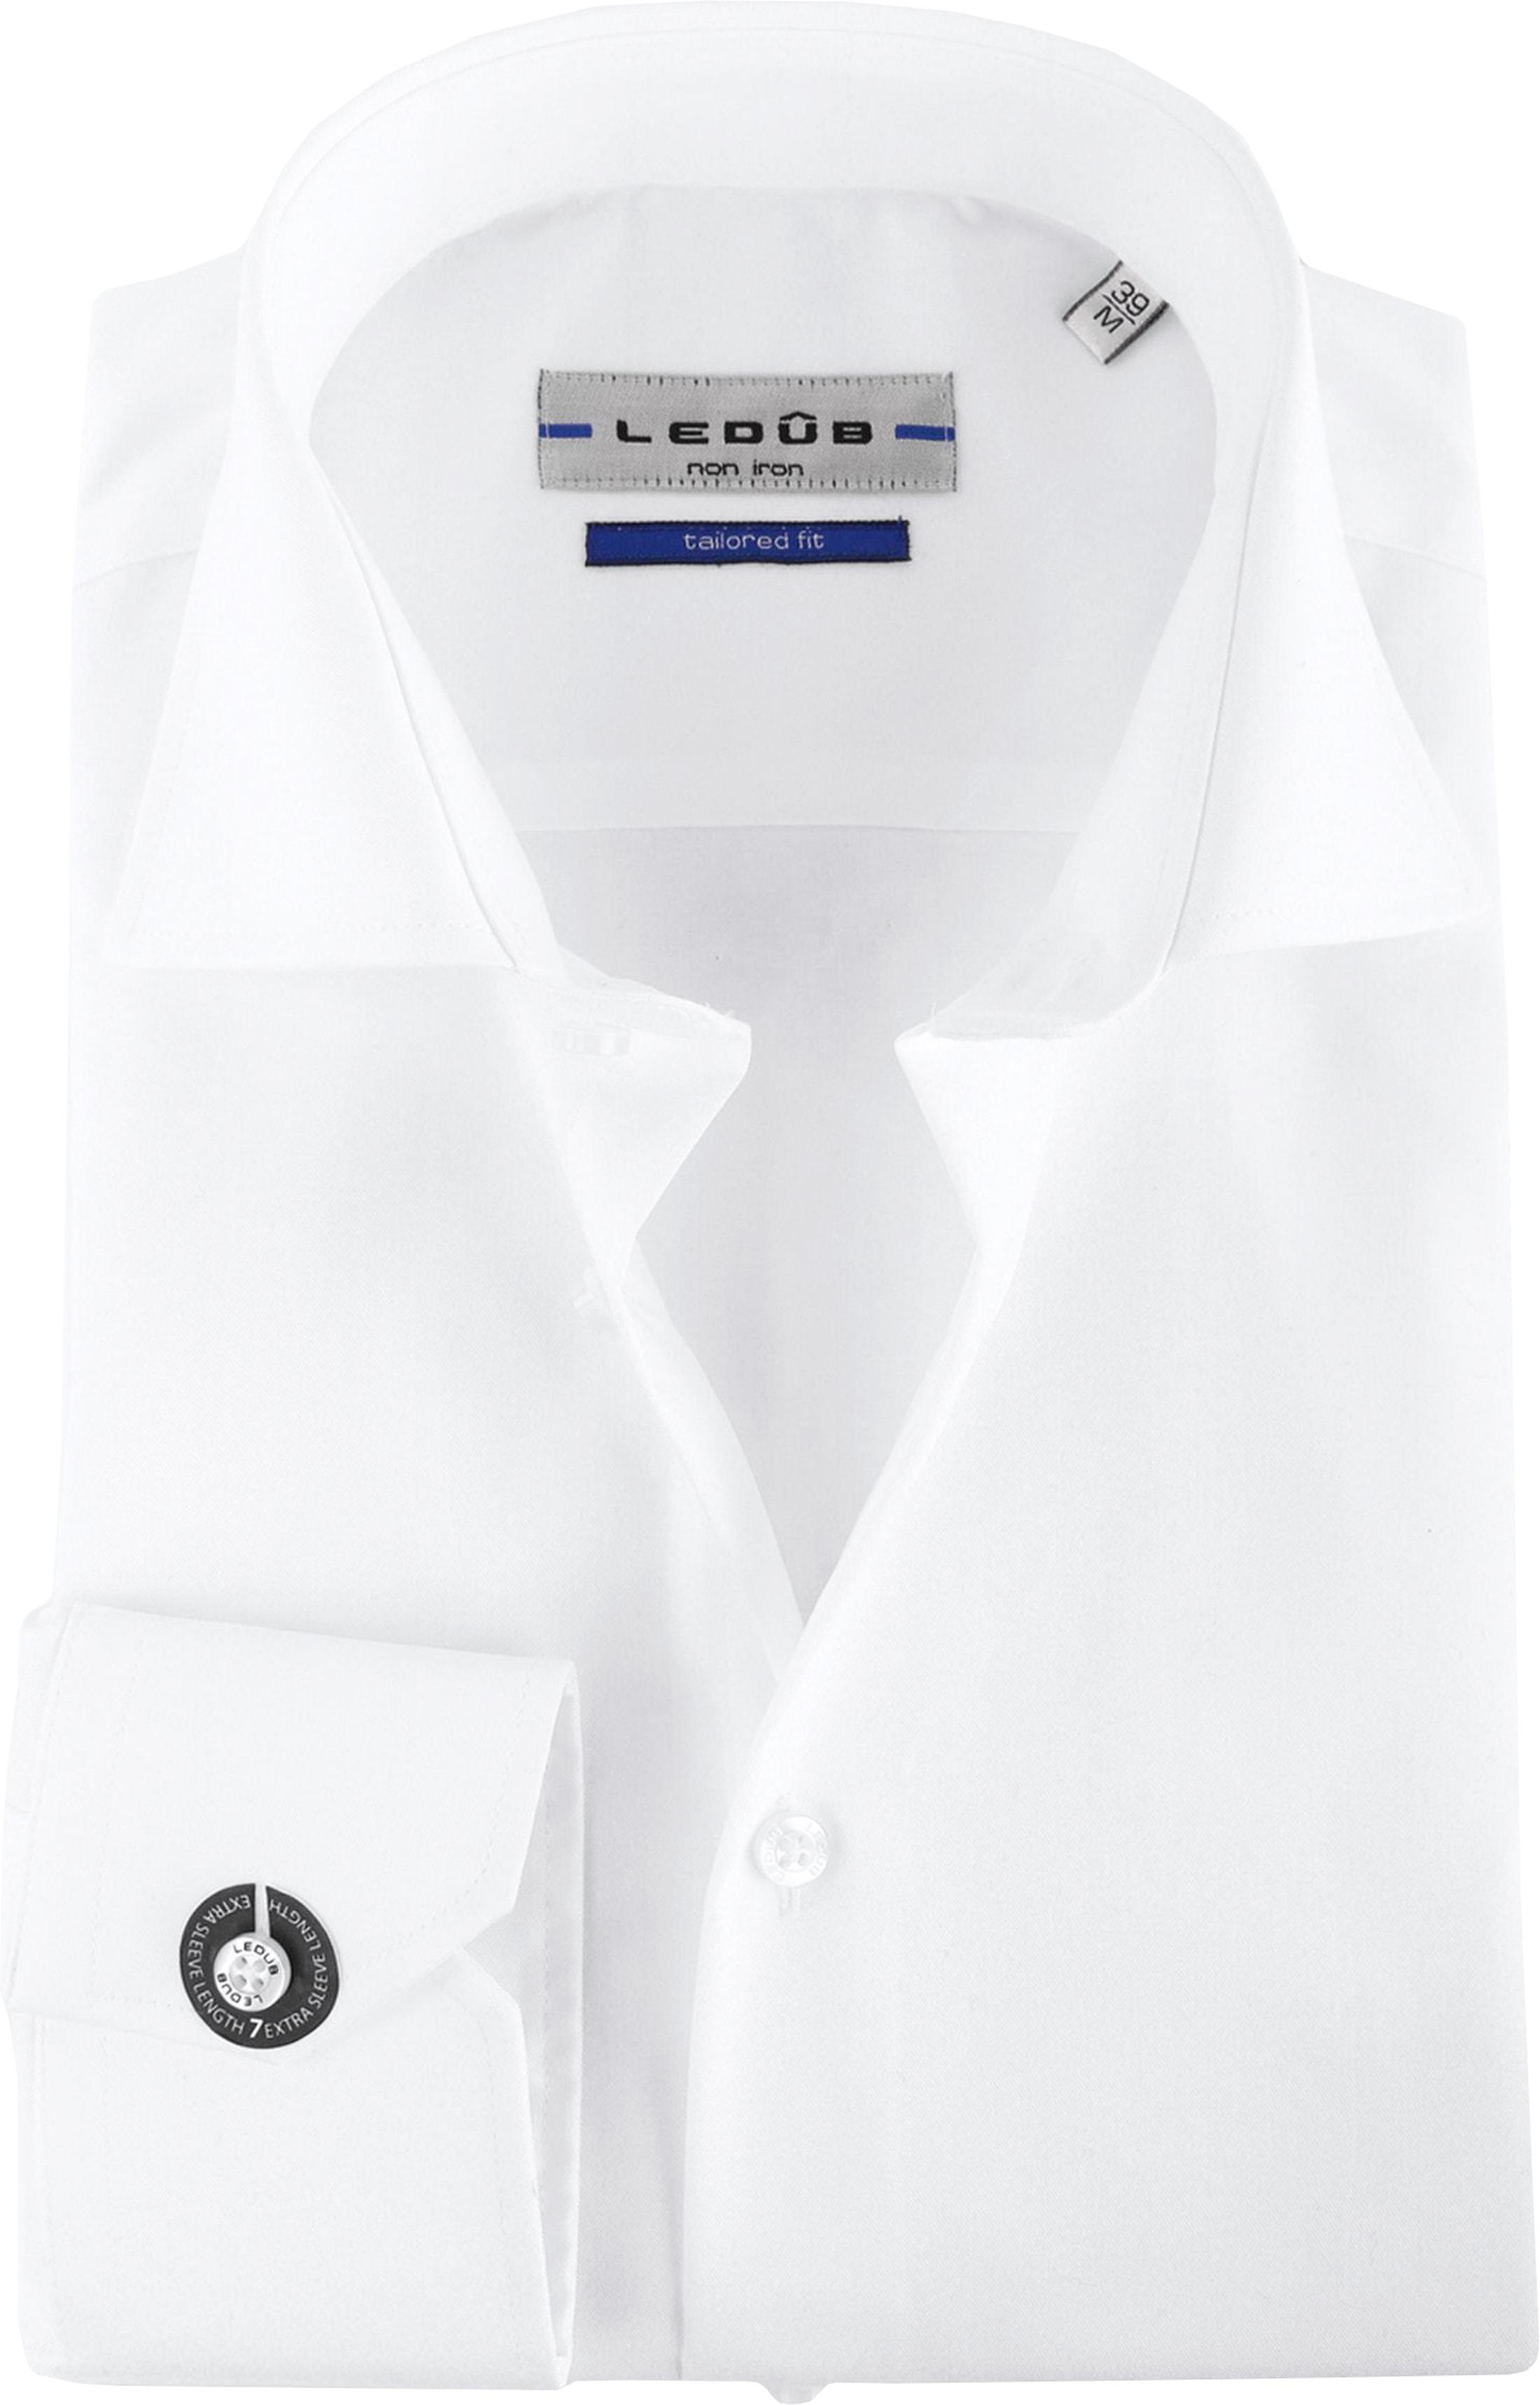 Ledub SL7 Hemd Bügelfrei Weiß foto 0